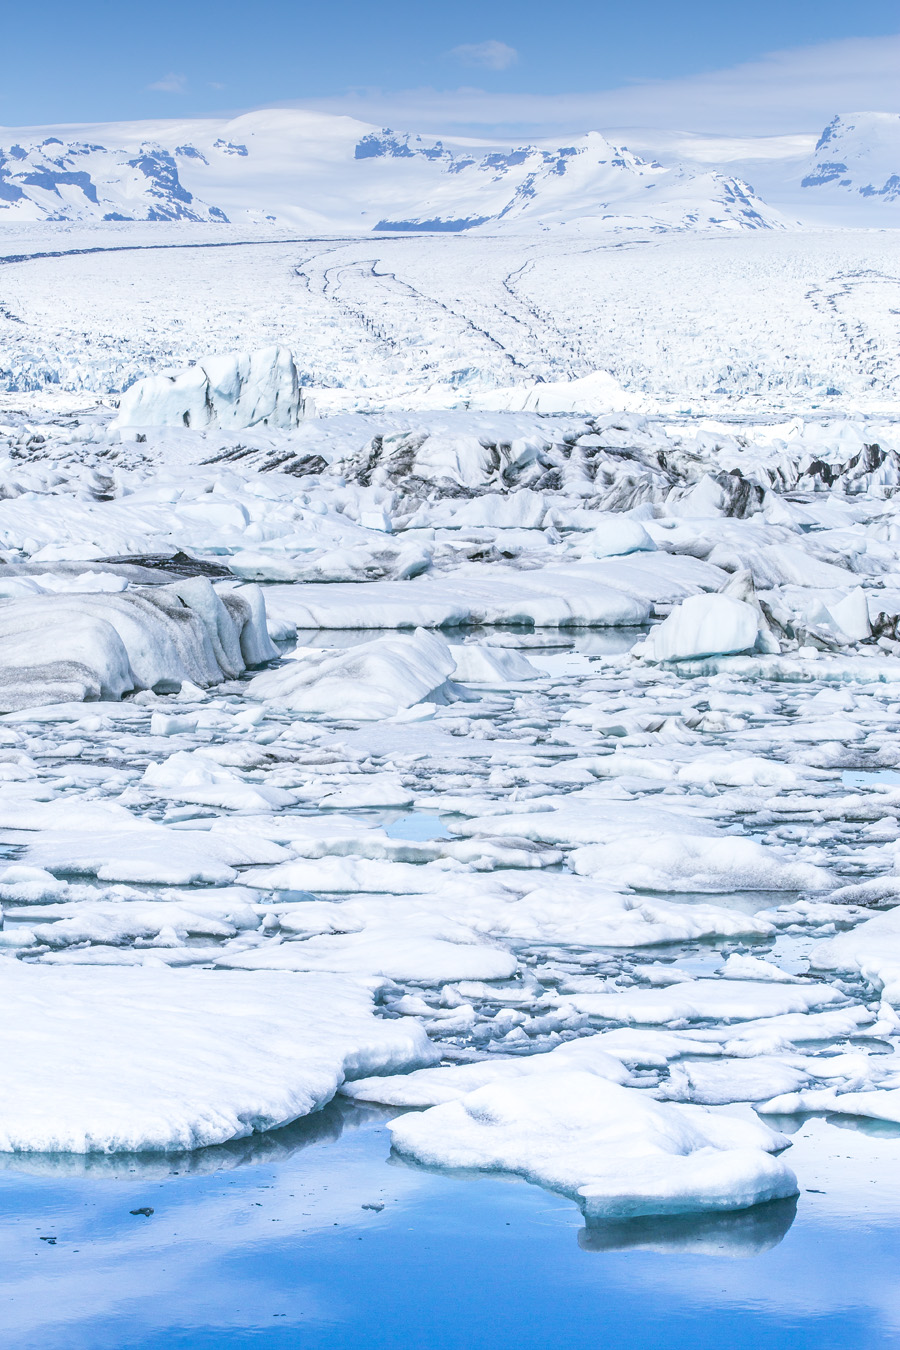 LANDSCAPE-023 ヨゥクルスアゥルロン 氷河湖